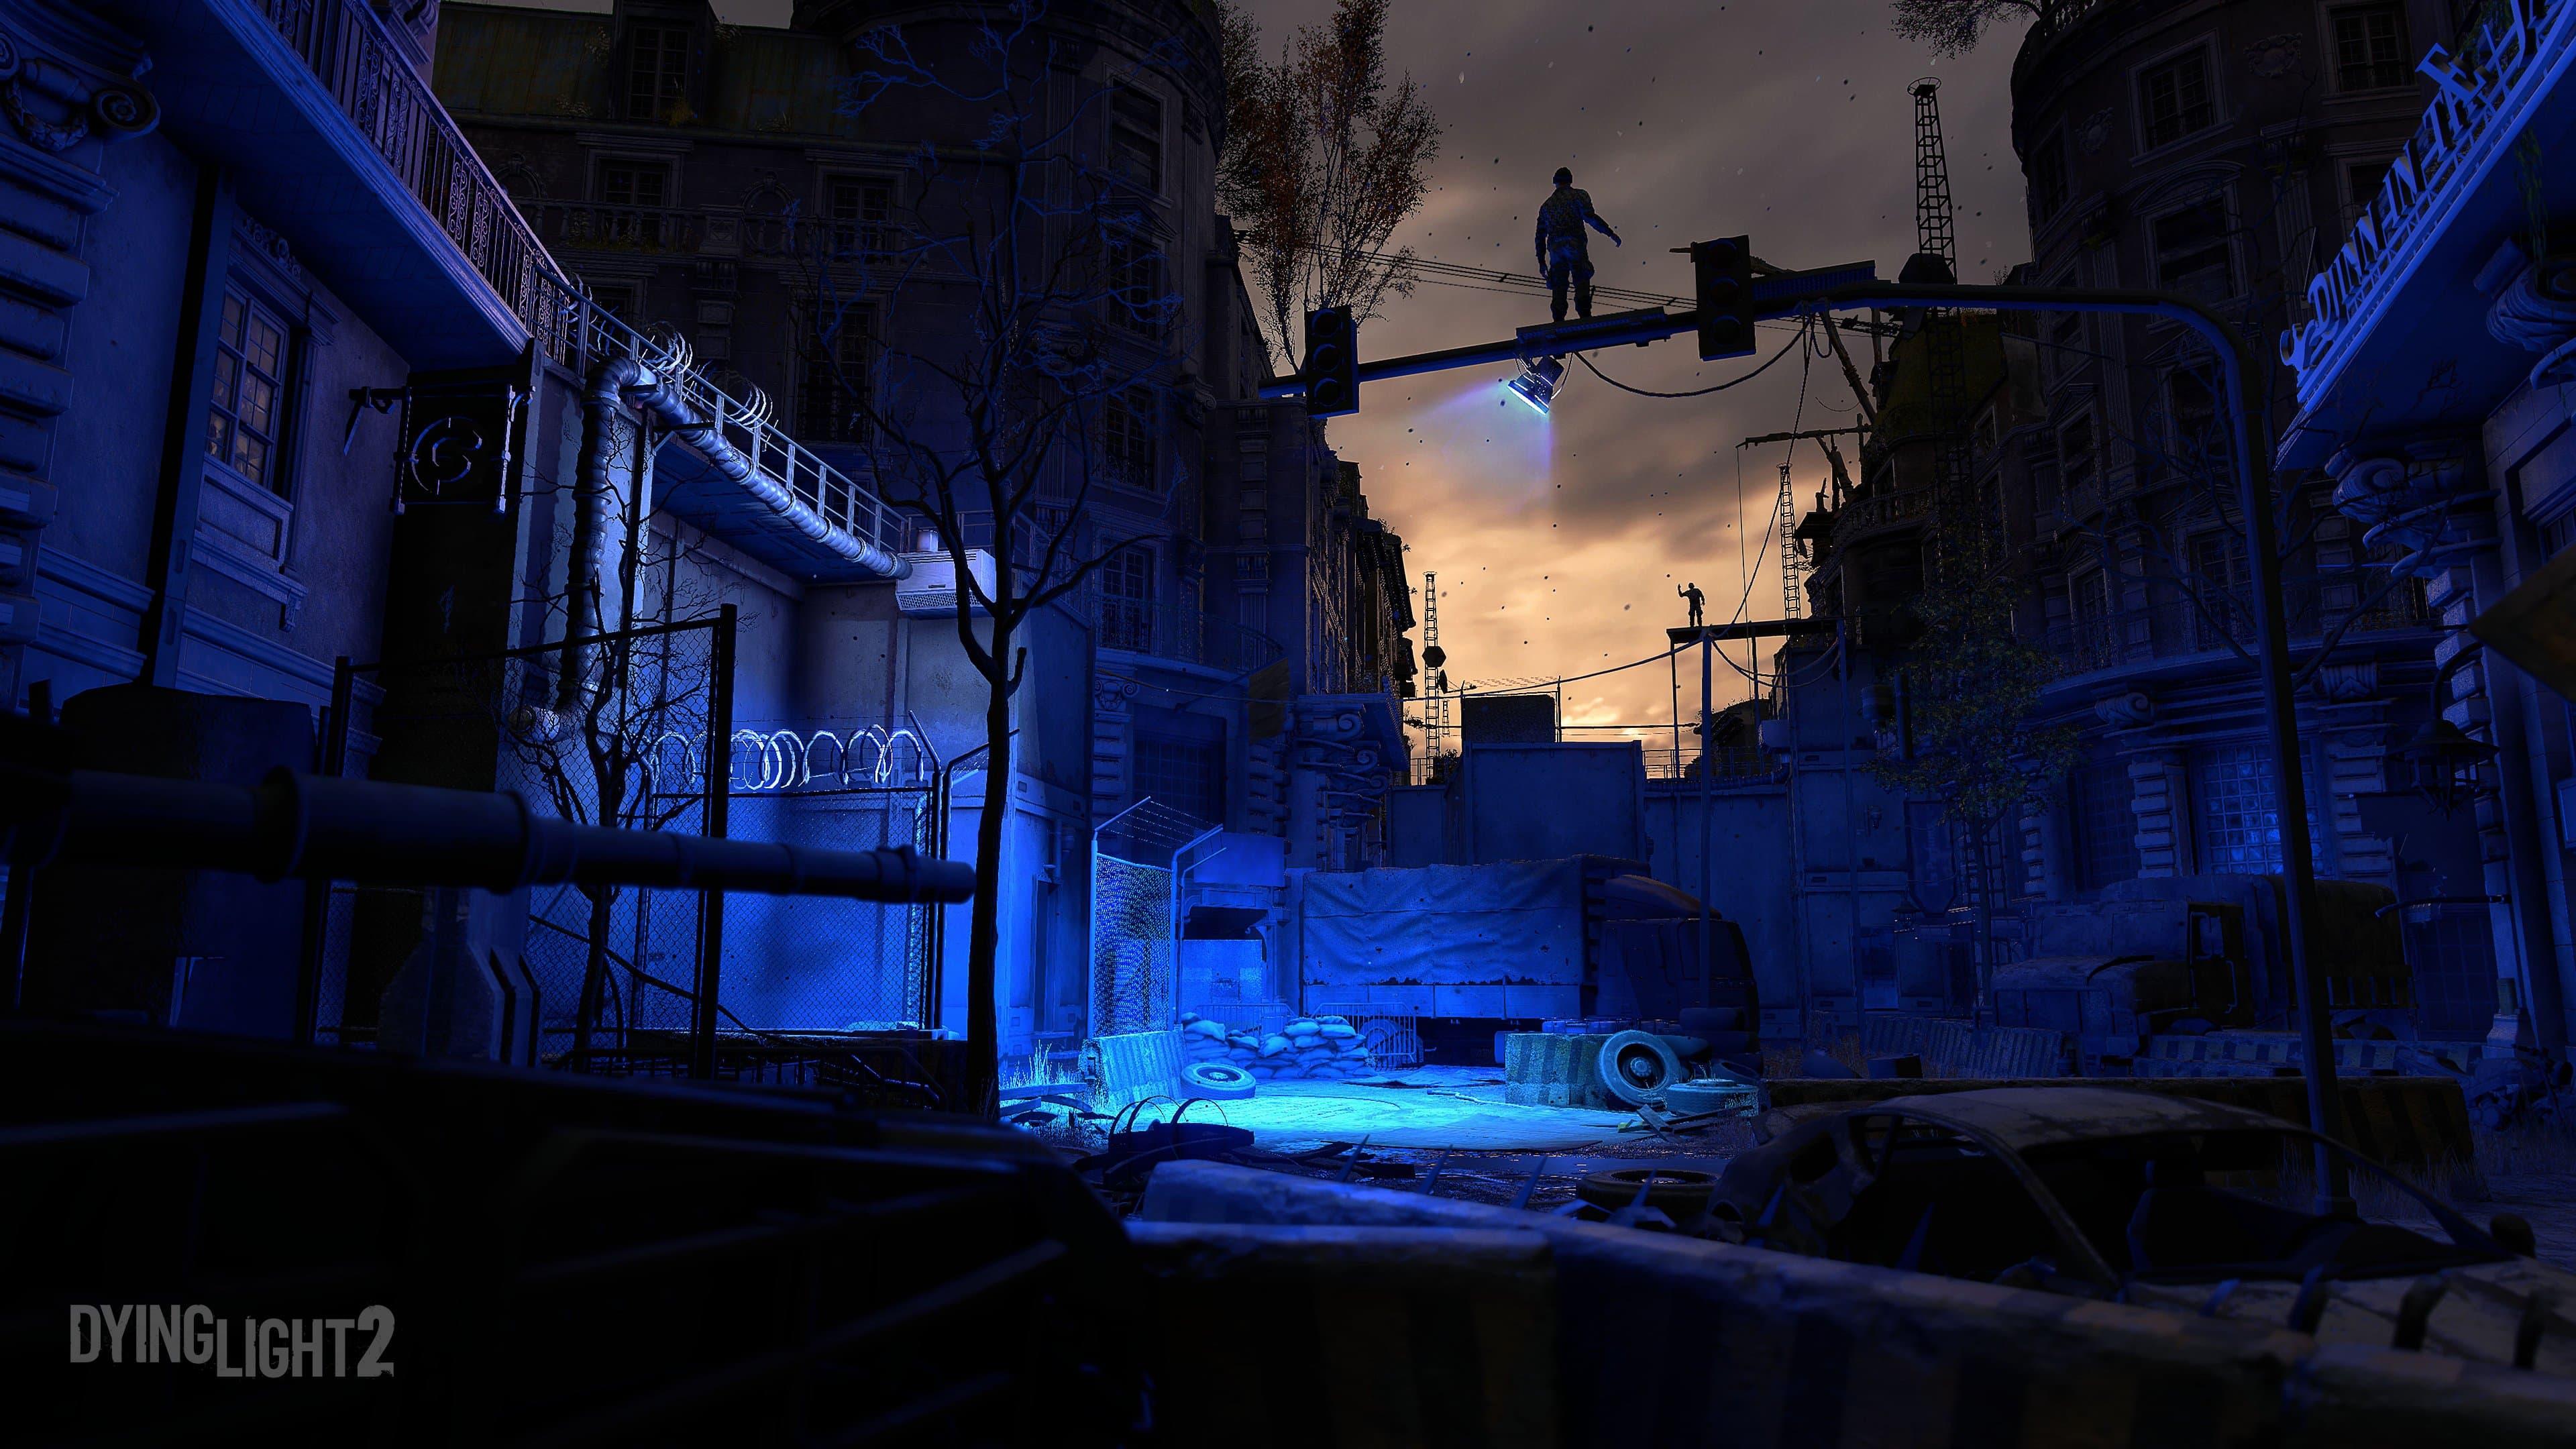 Dying Light 2 - Image n°6